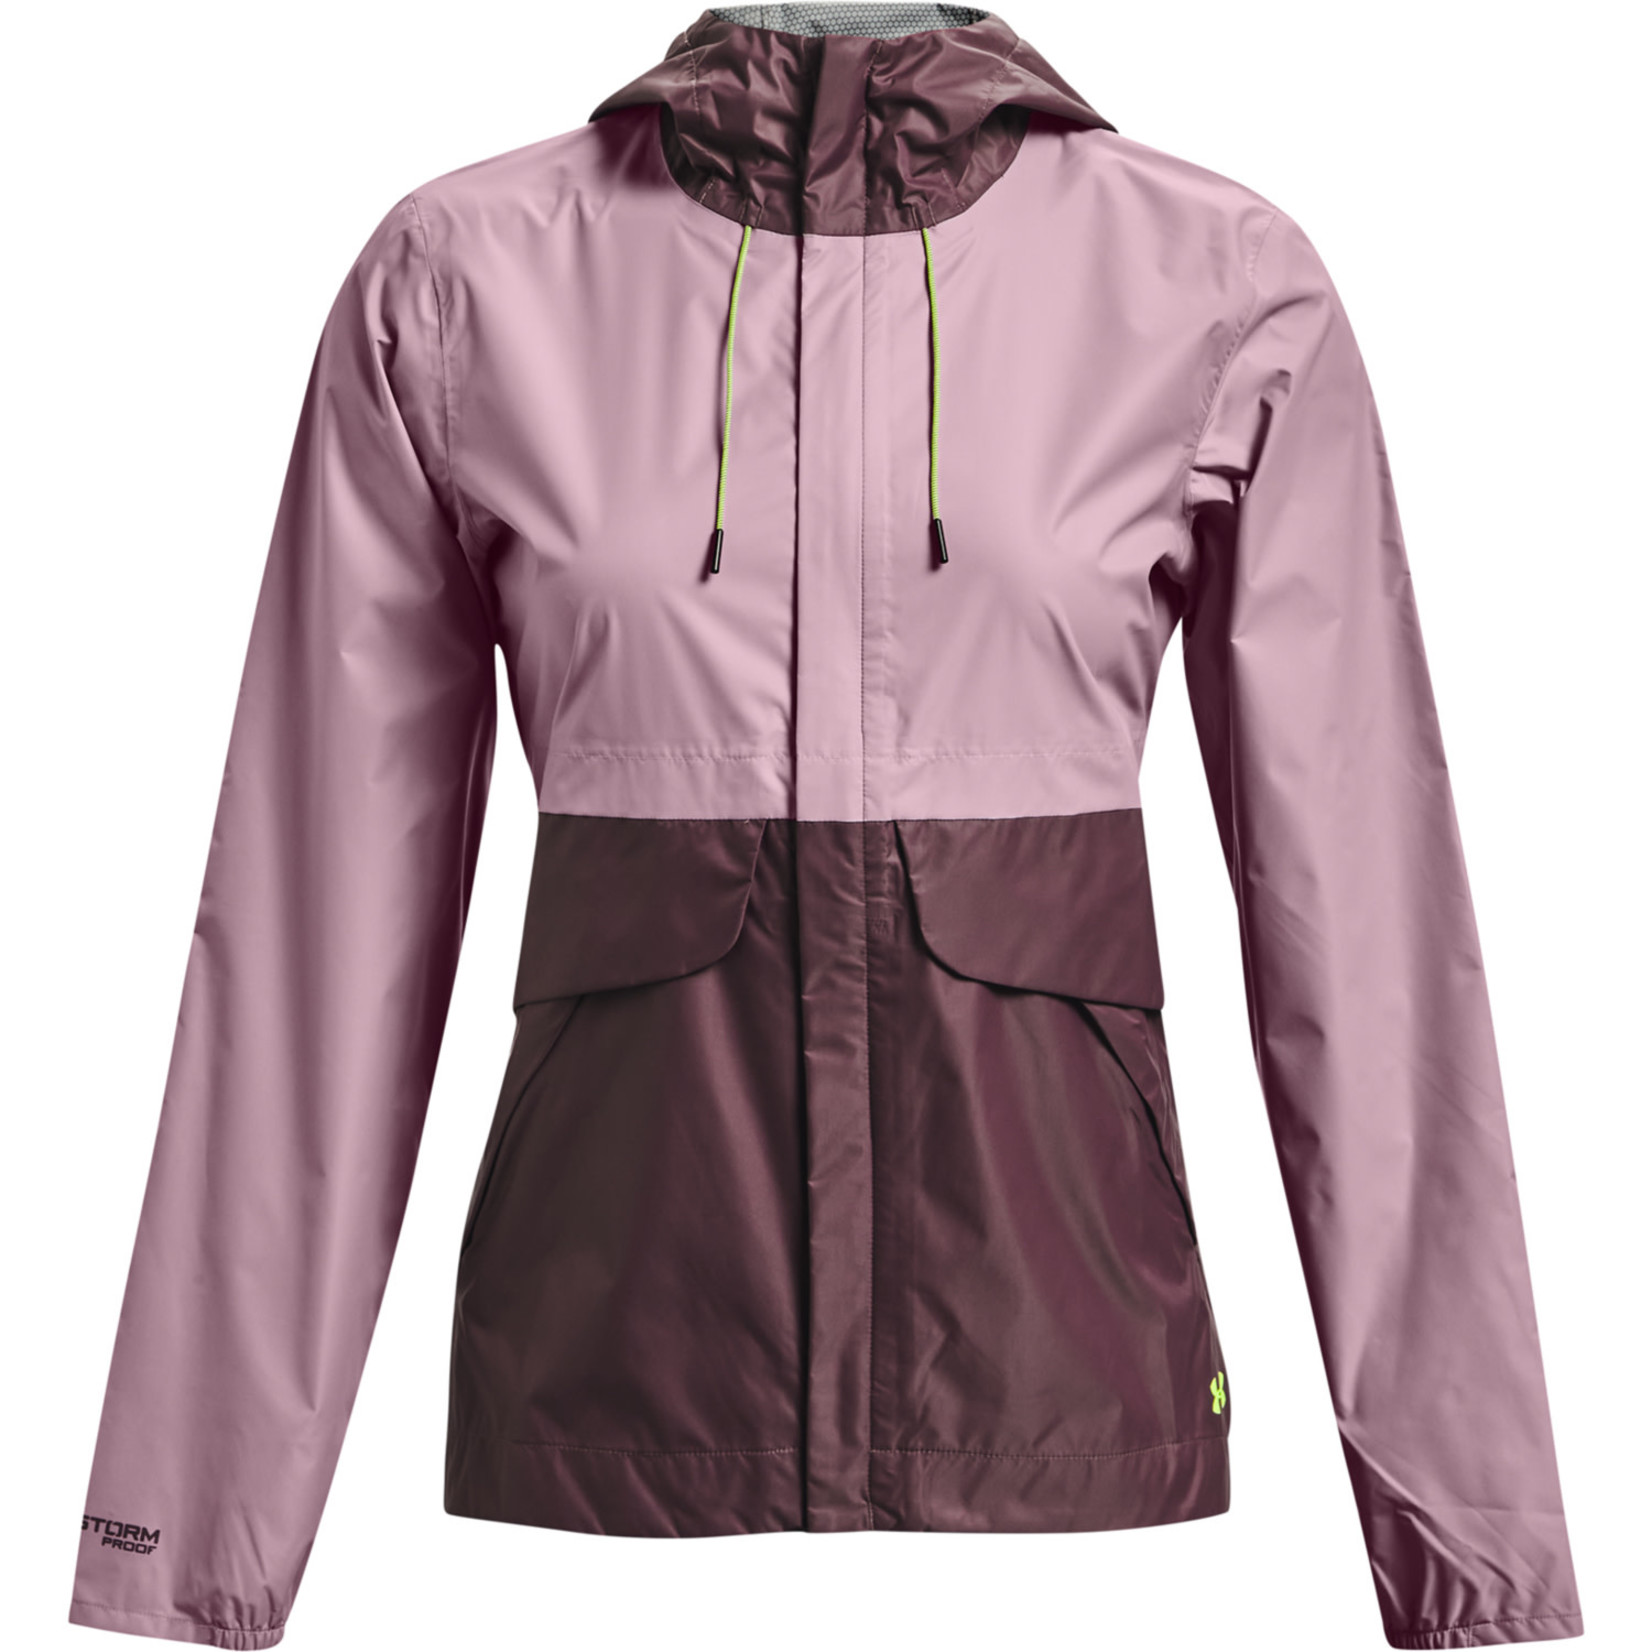 Under Armour UA Cloudstrike Shell Jacket-Pink